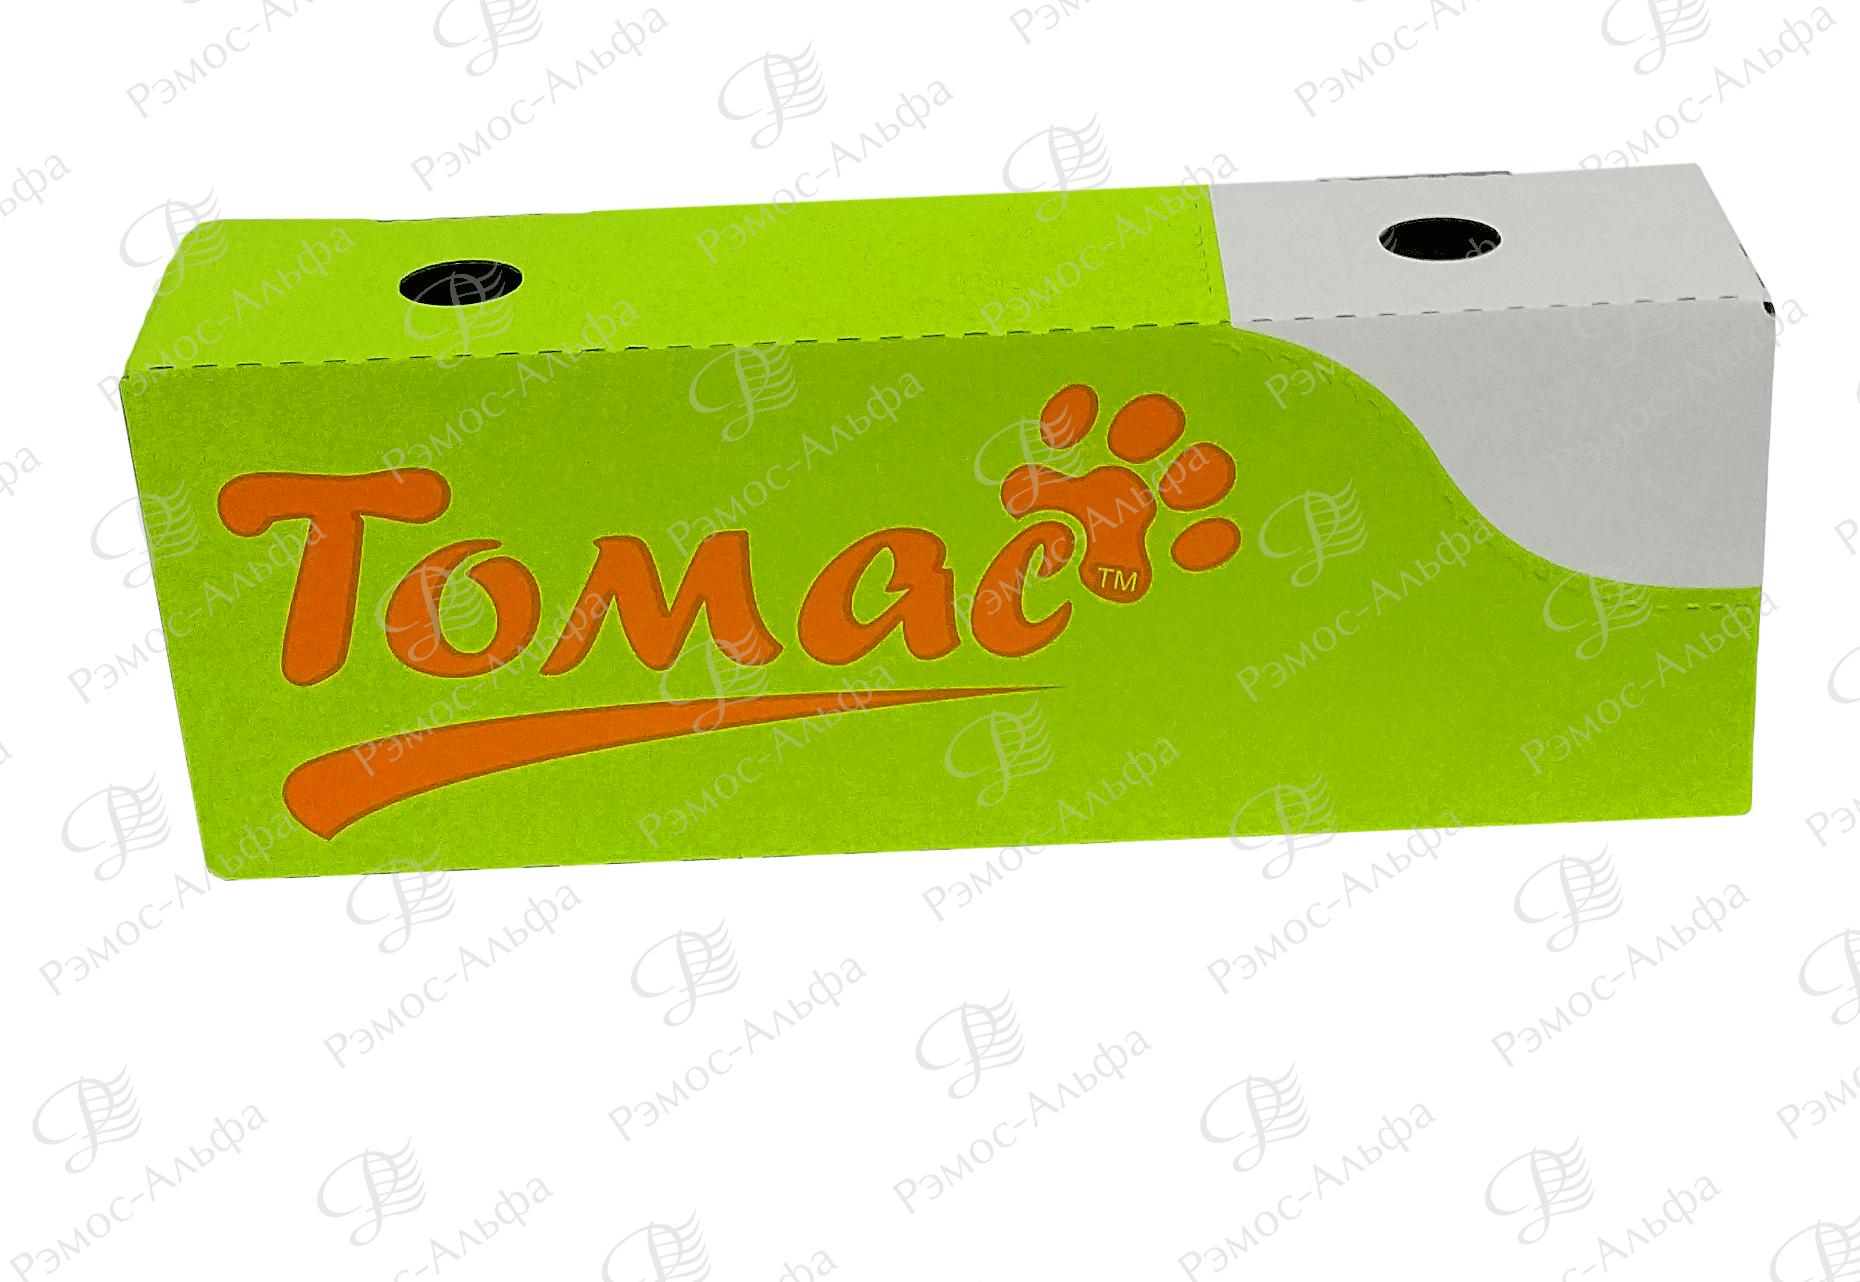 вз-Томас1.png